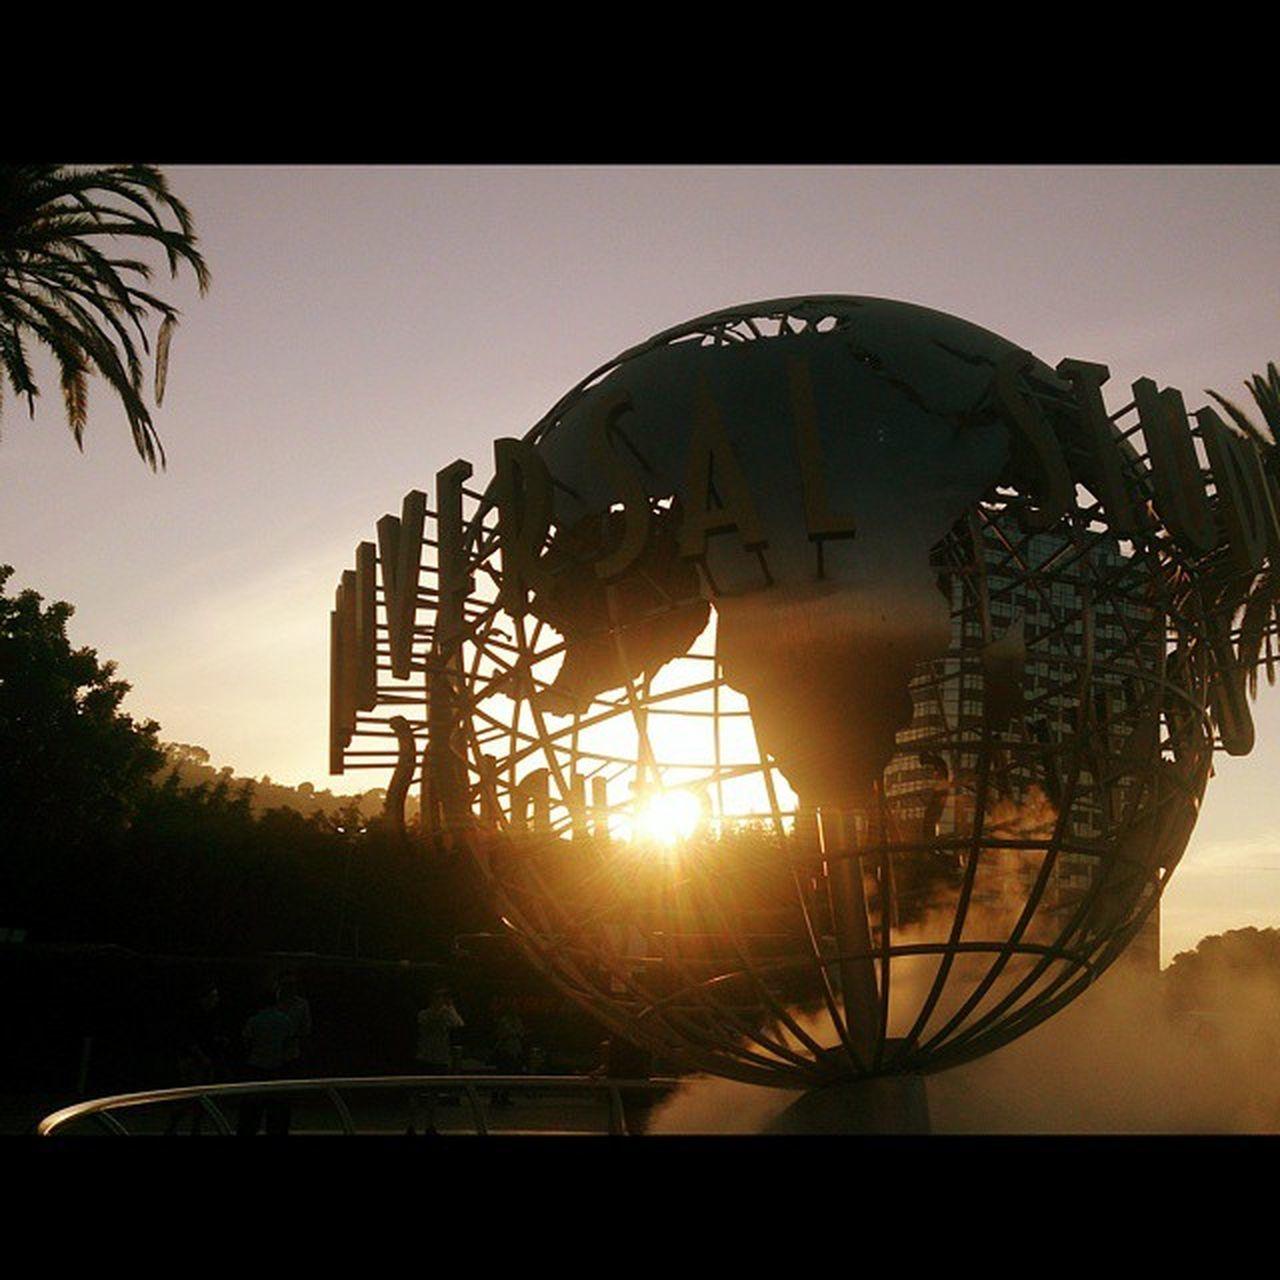 Universal Studios Universalstudios Hollywood Calfornien Wonderfullplace onceinalifetime kaumzuglauben